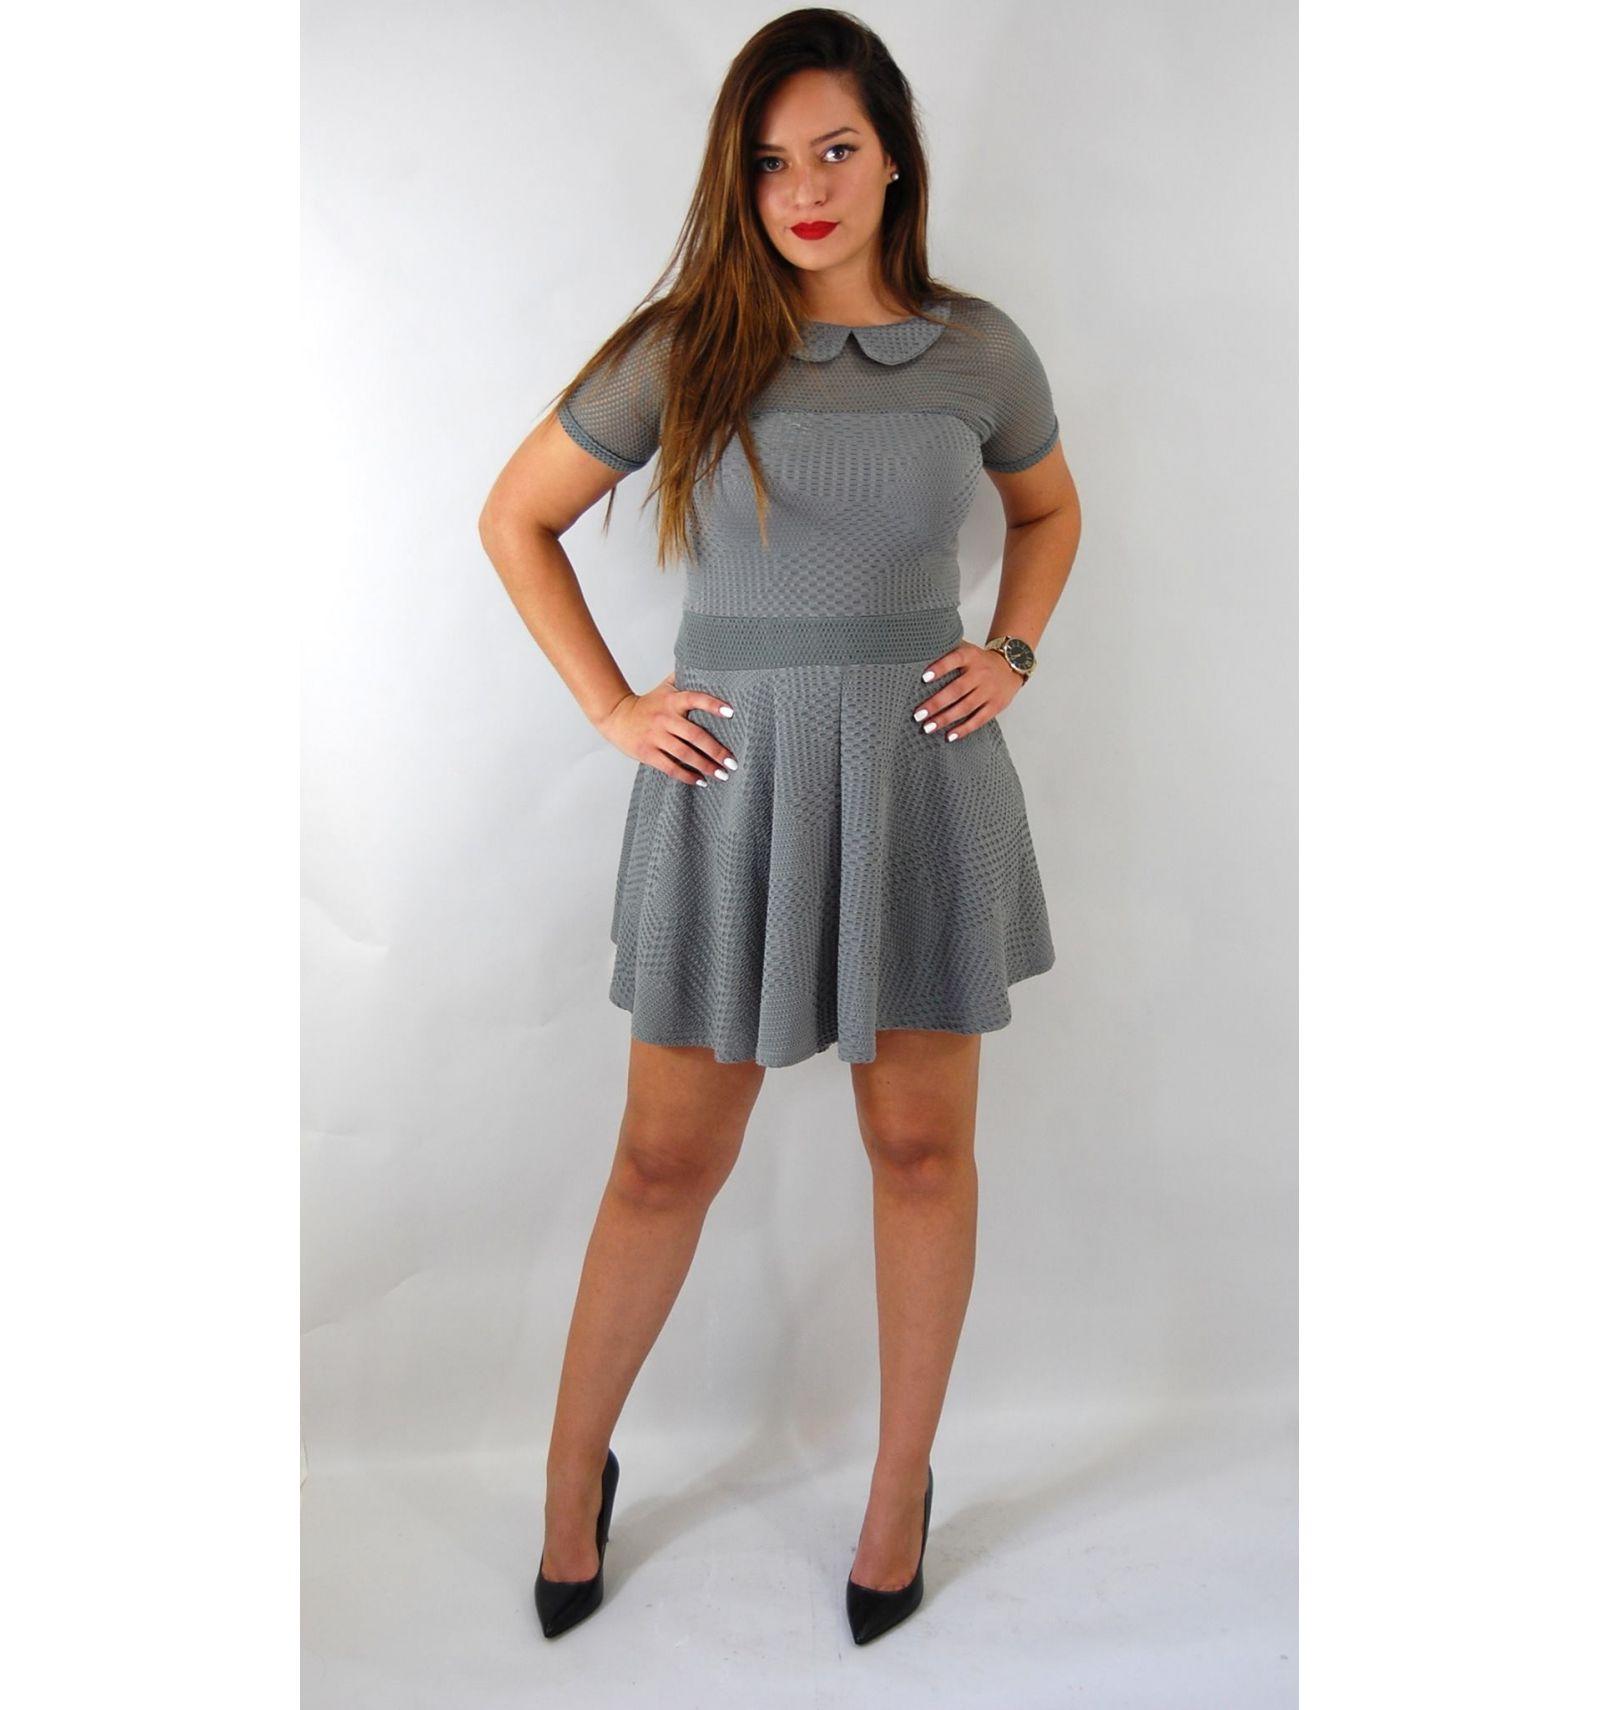 acheter une robe patineuse grise pas ch re. Black Bedroom Furniture Sets. Home Design Ideas